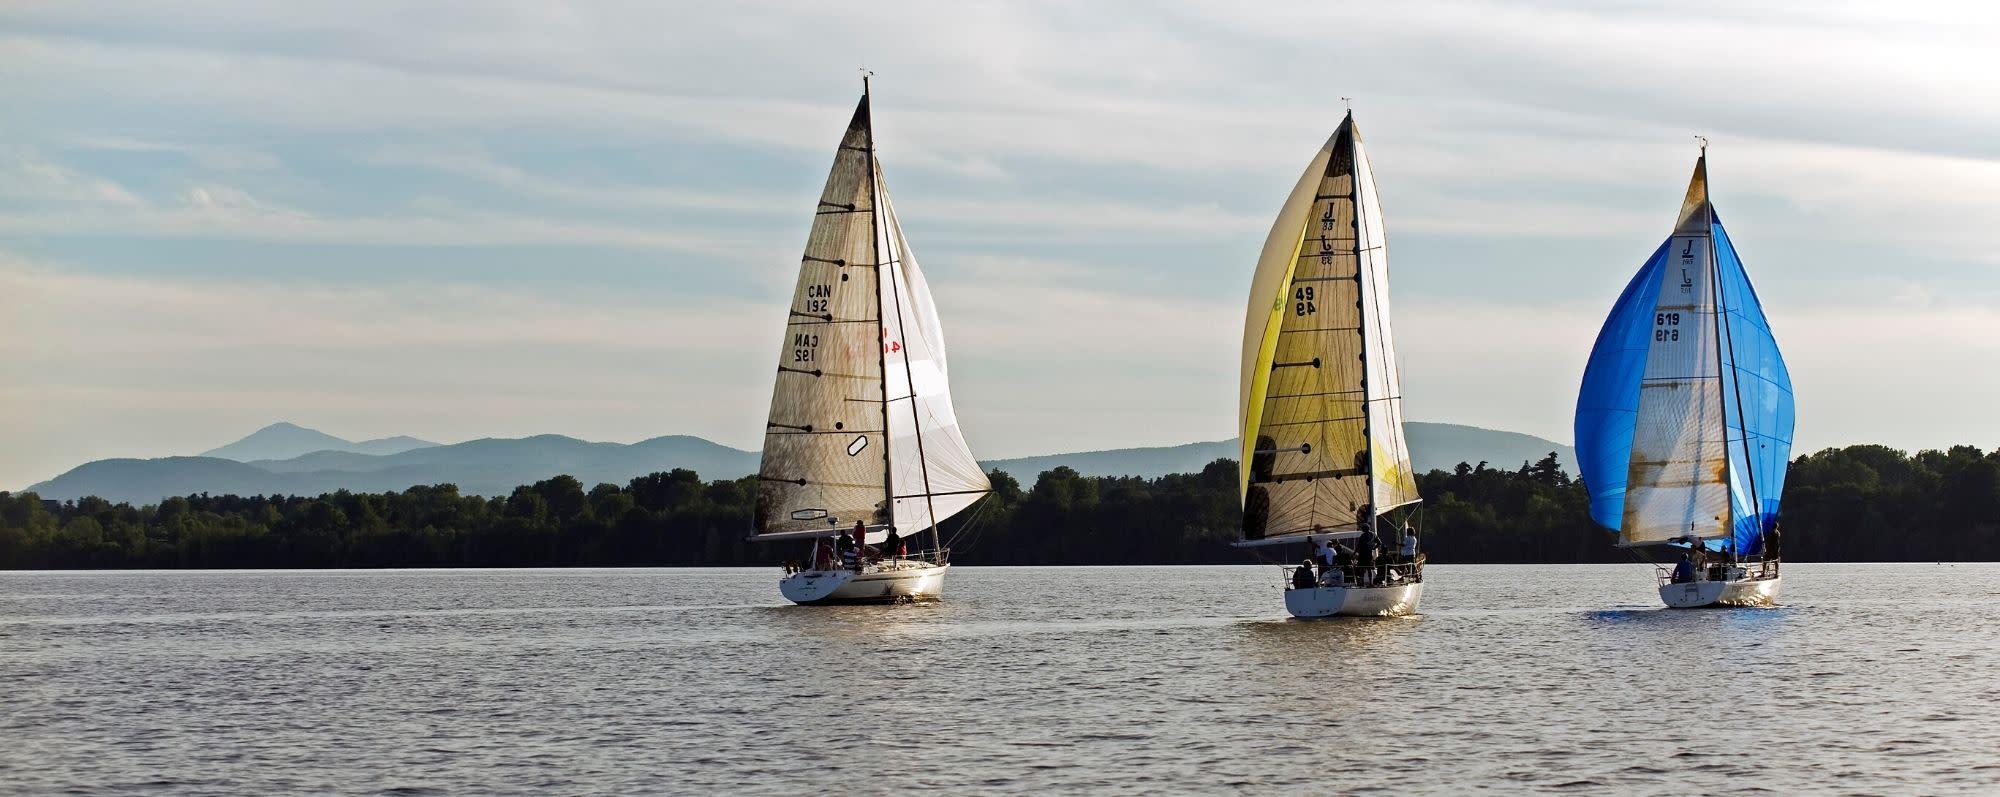 Three sailboats on Lake Champlain, photo by Darren McGee